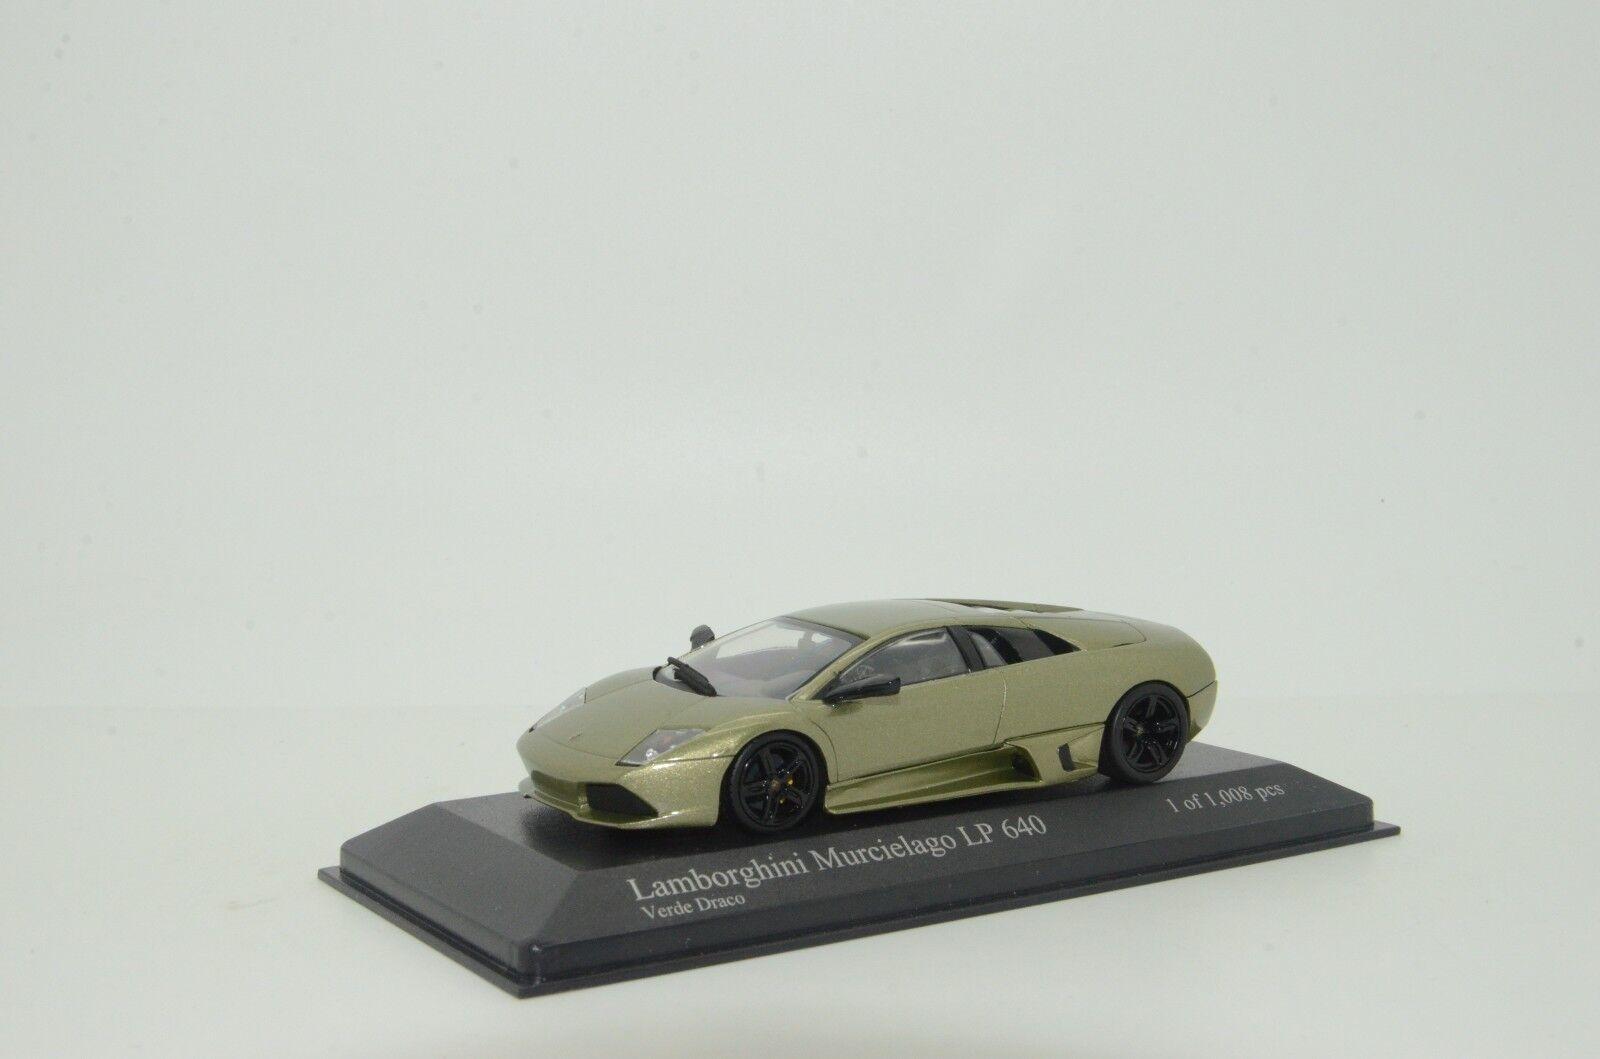 Raro  Lamborghini Murcielago LP640 2006 verde Metalizado Minichamps 103921 1 43 7afdd3